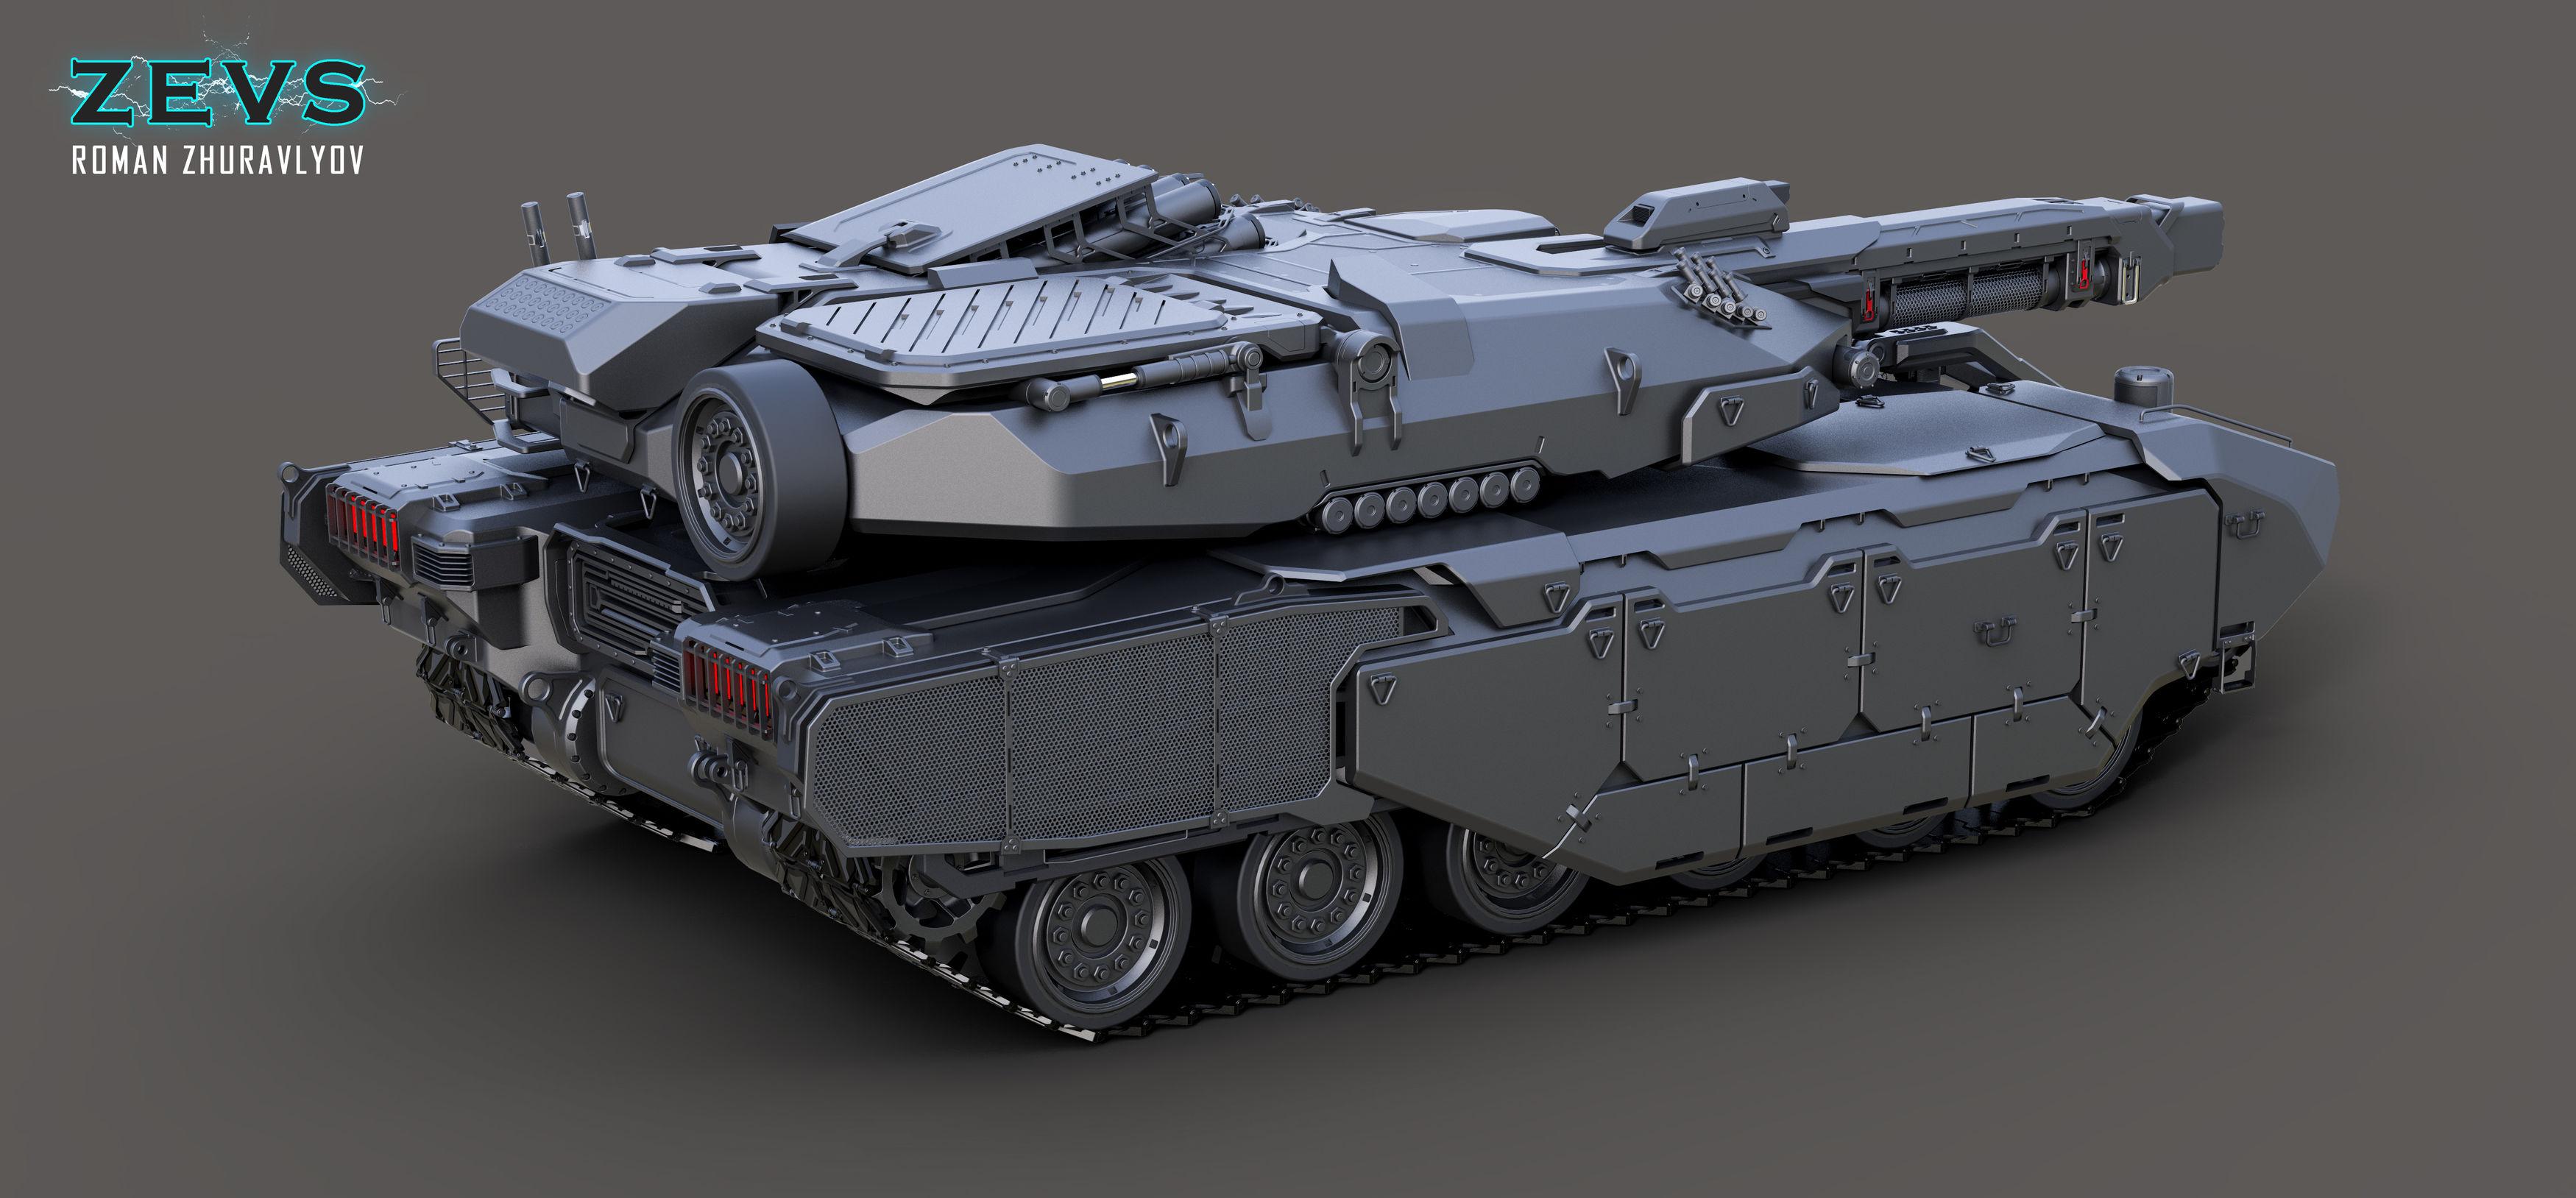 Tank-zevs-4-3500-3500